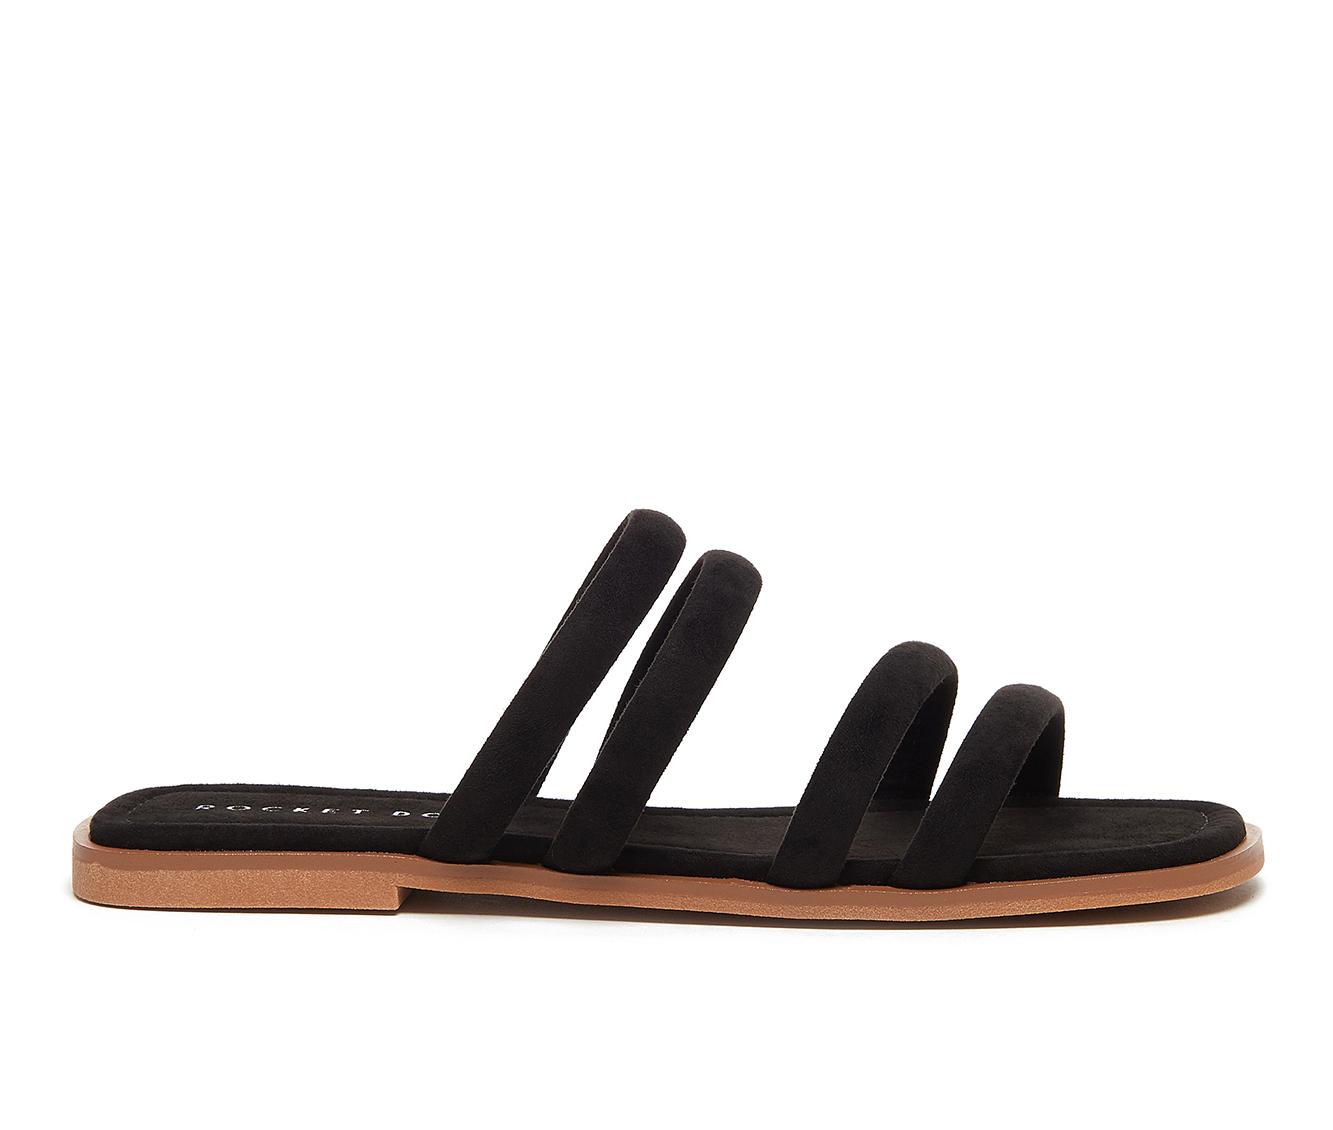 Rocket Dog Felicia Women's Sandal (Black Faux Leather)